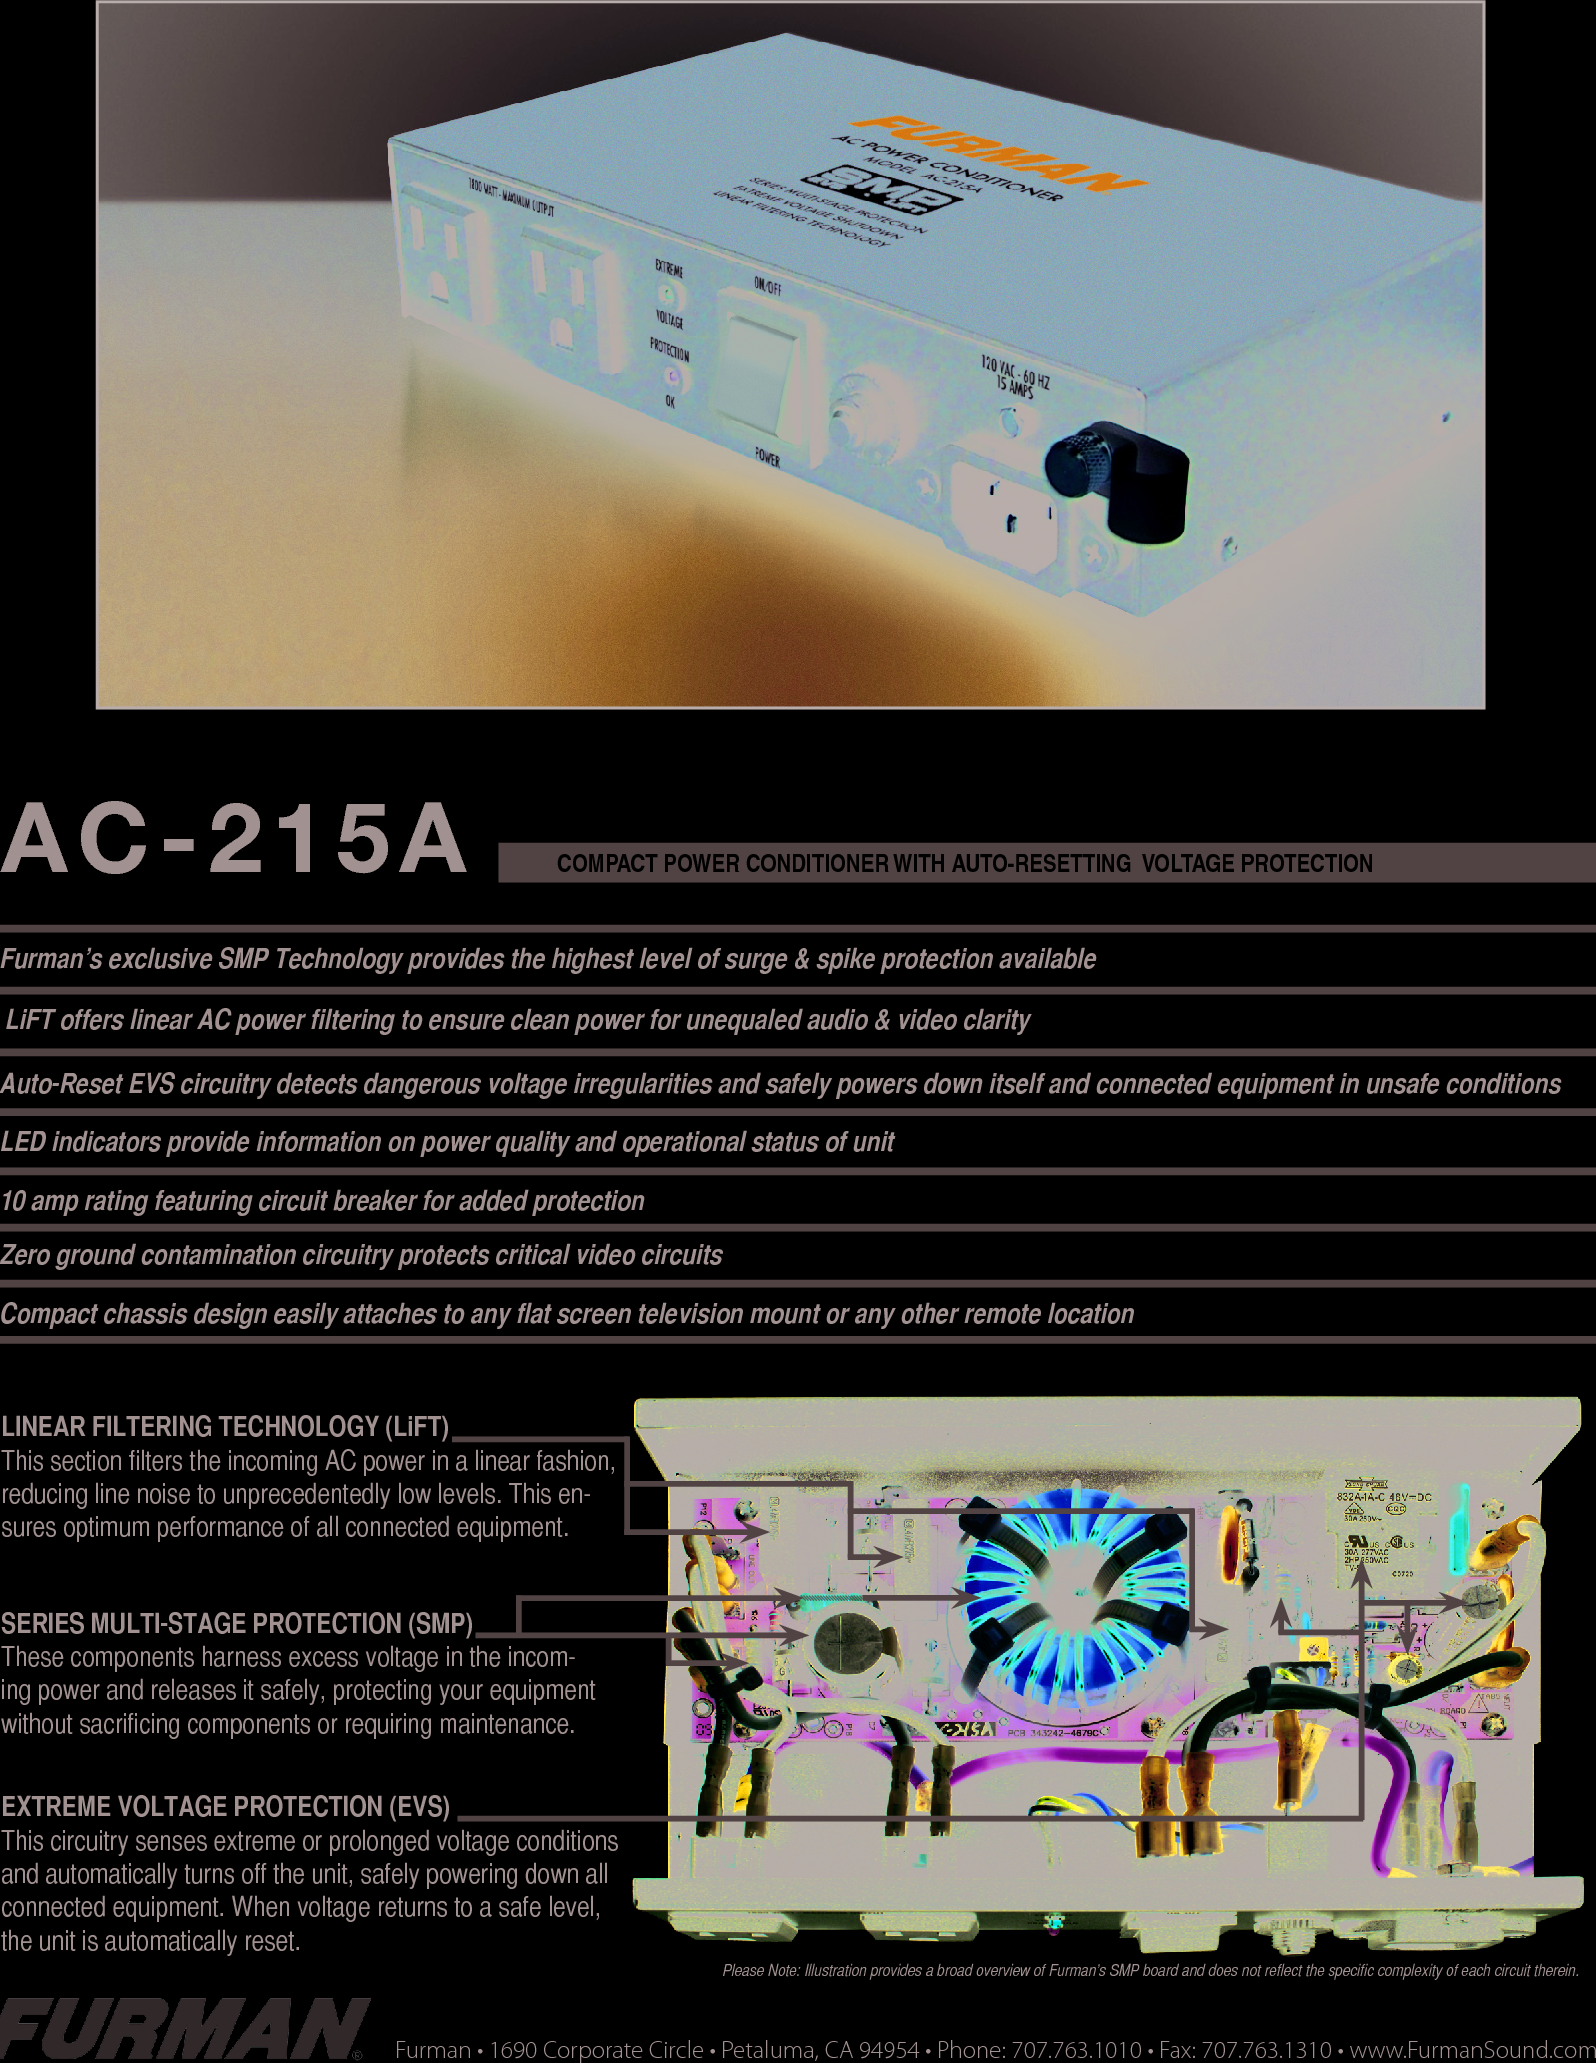 auto a c troubleshooting guide pdf rh auto a c troubleshooting guide pdf angelayu us